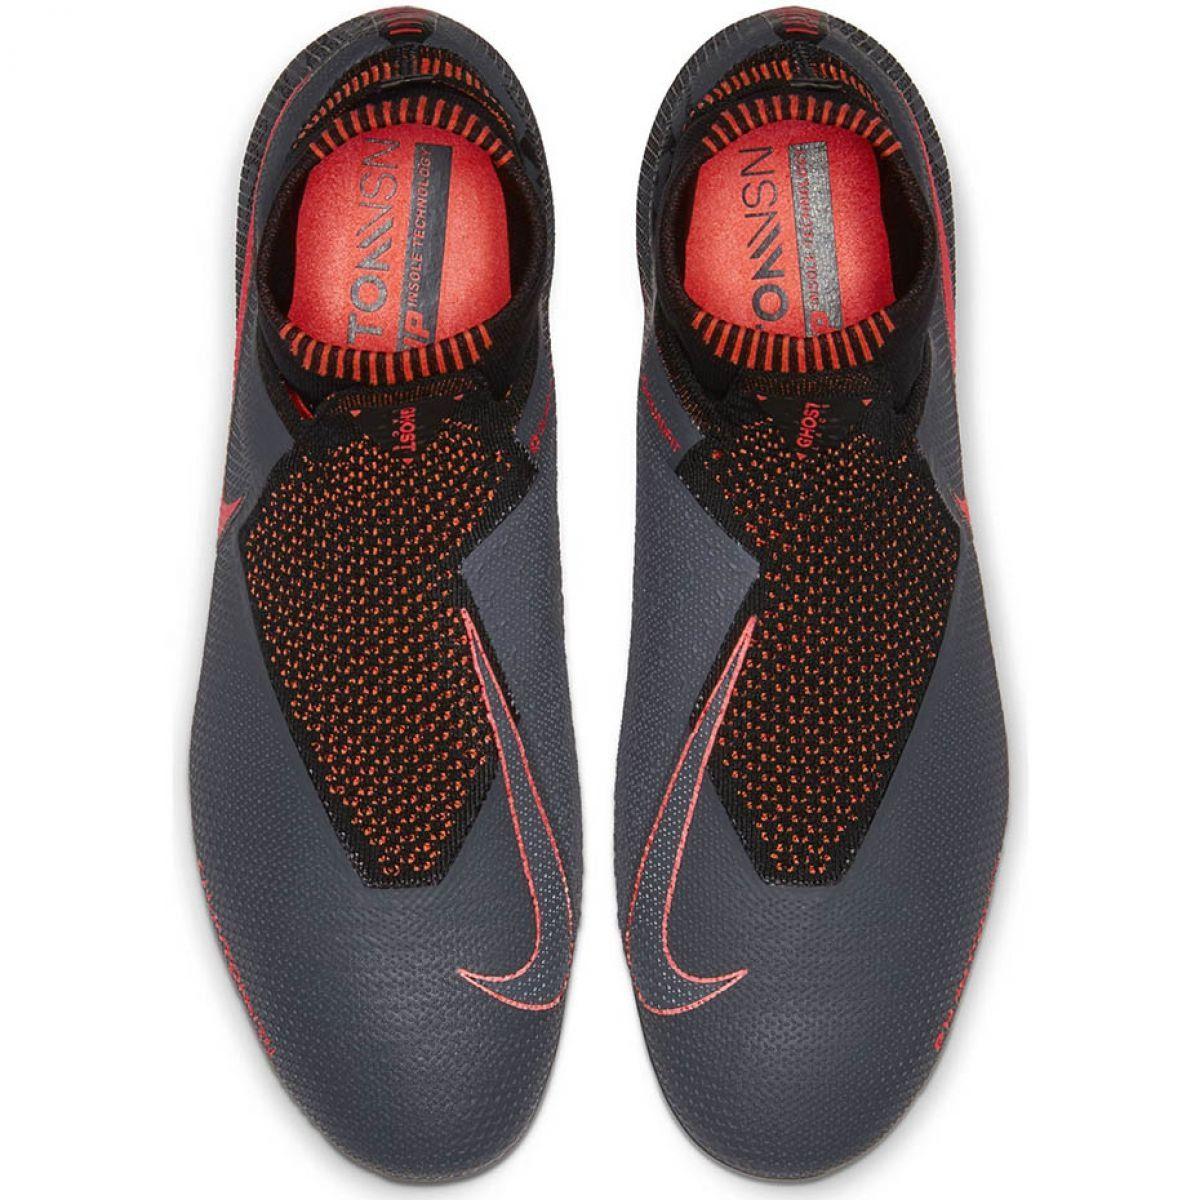 Nike Phantom Vsn Elite Df Fg M AO3262 080 football shoes